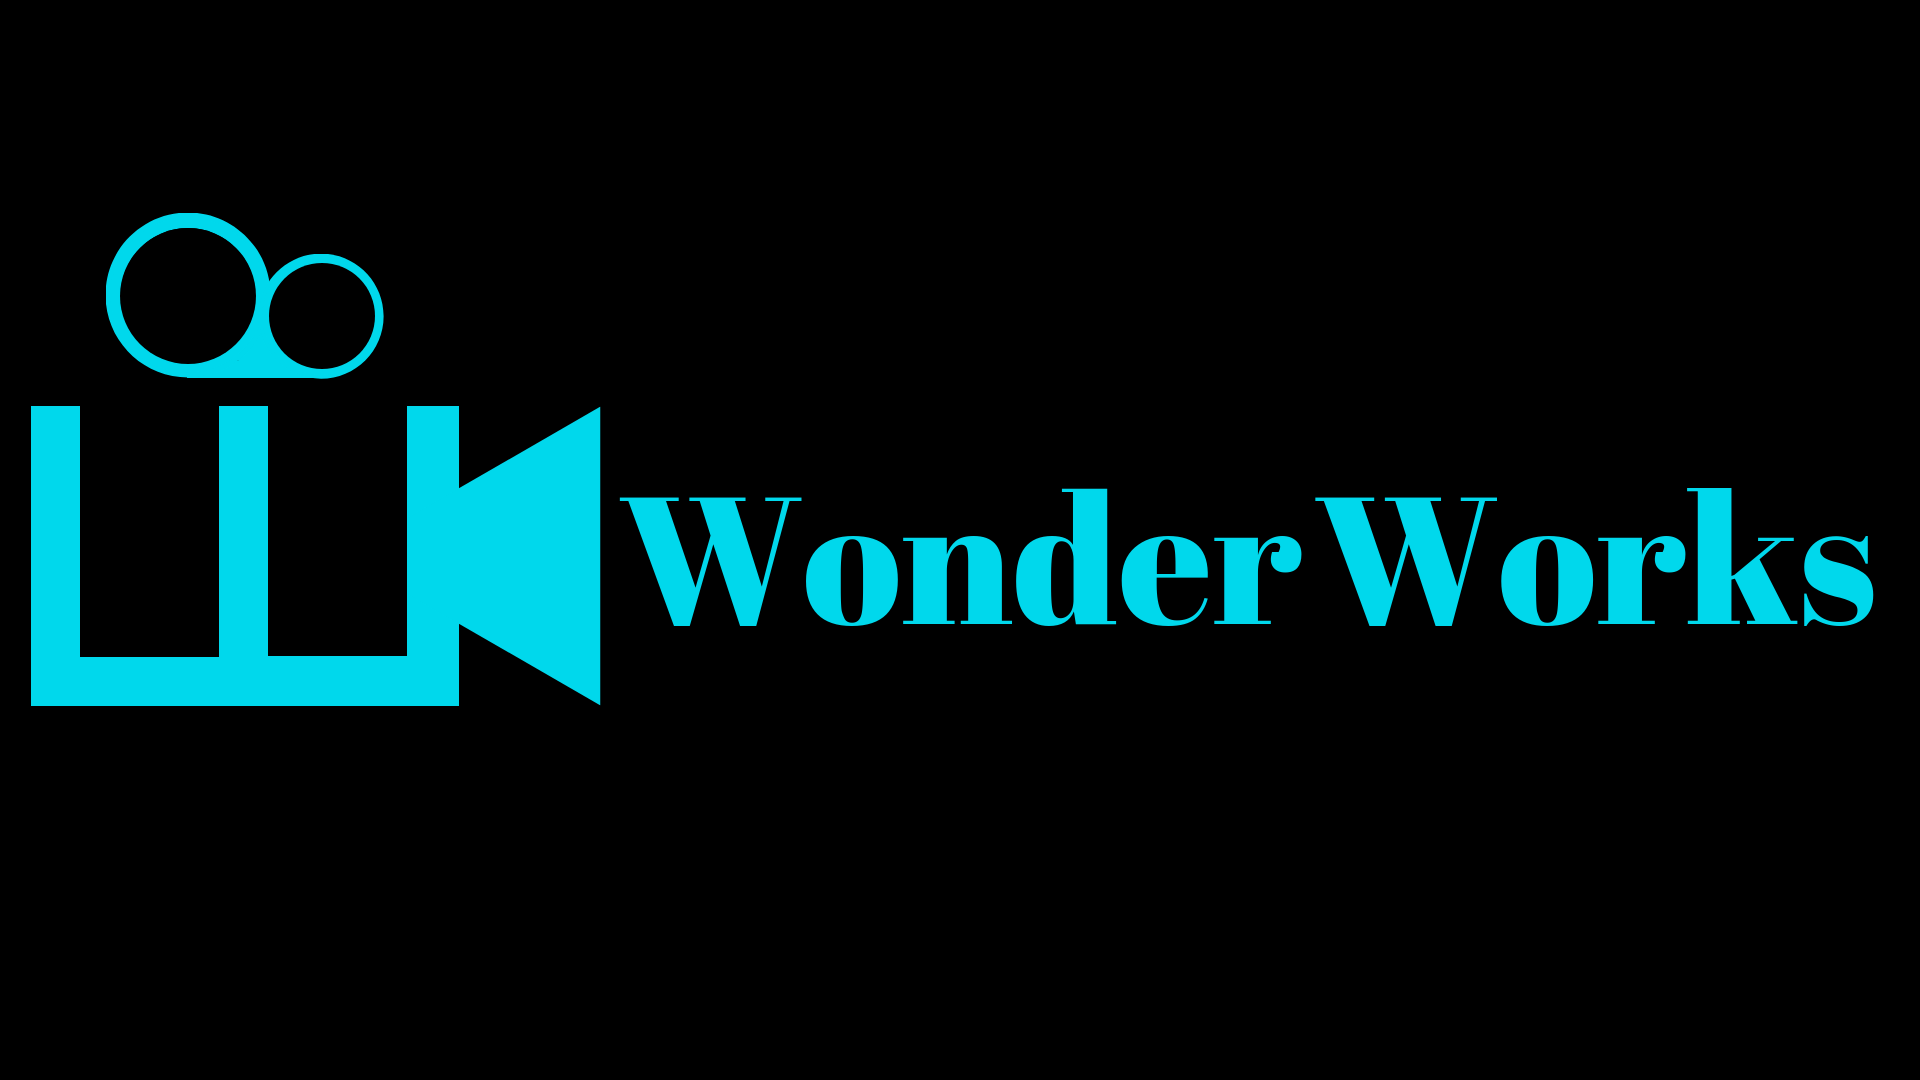 Wonder Works Films messages sticker-9